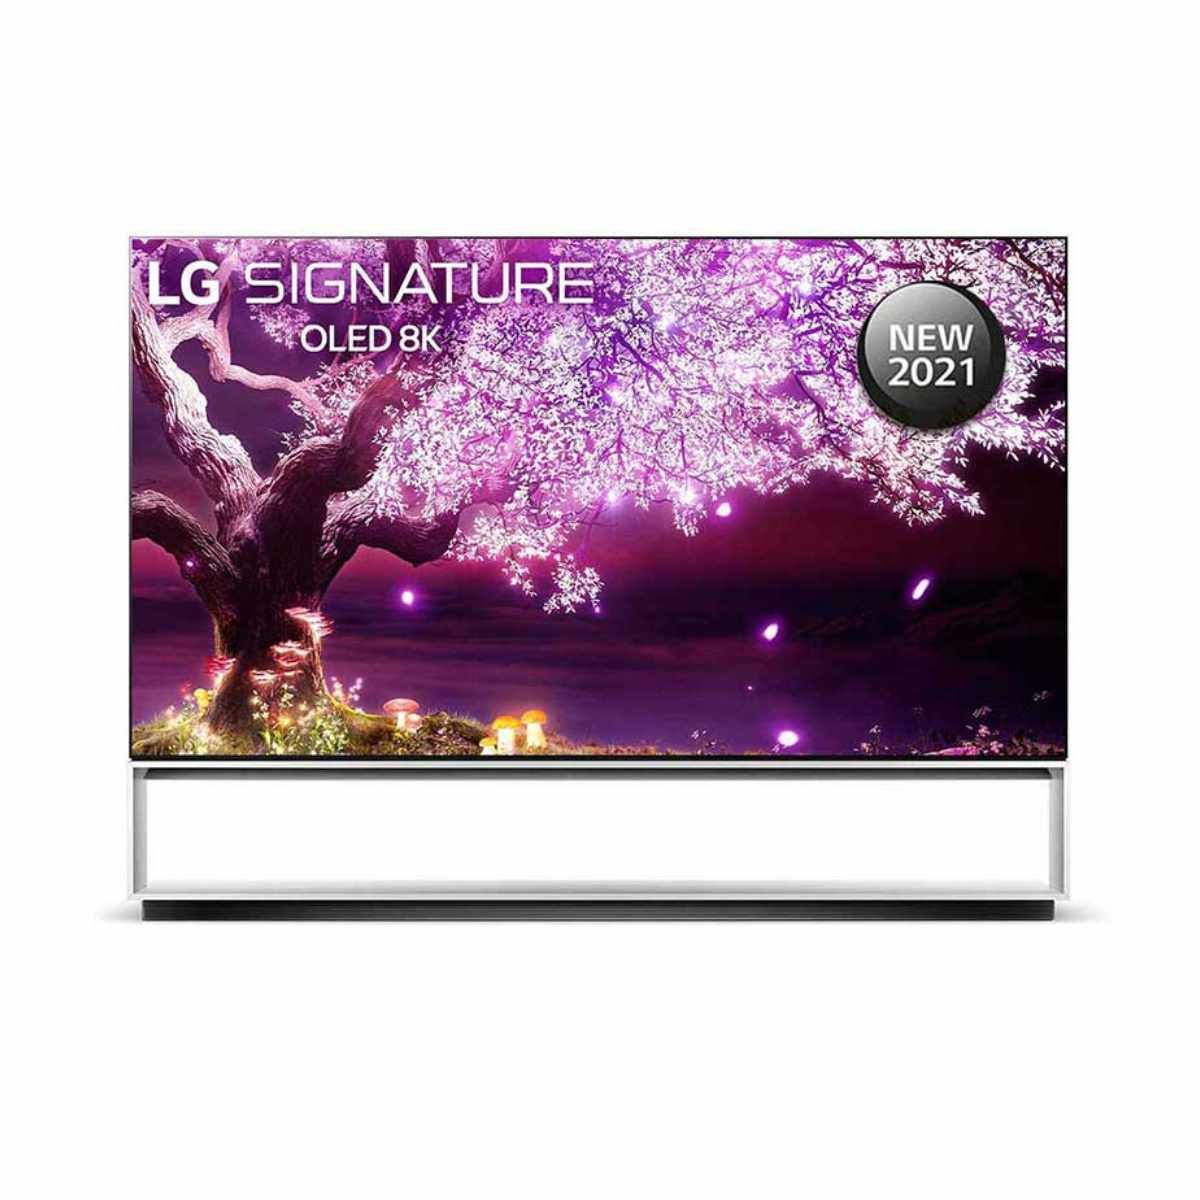 LG Z1 88-inch 8K Smart OLED TV